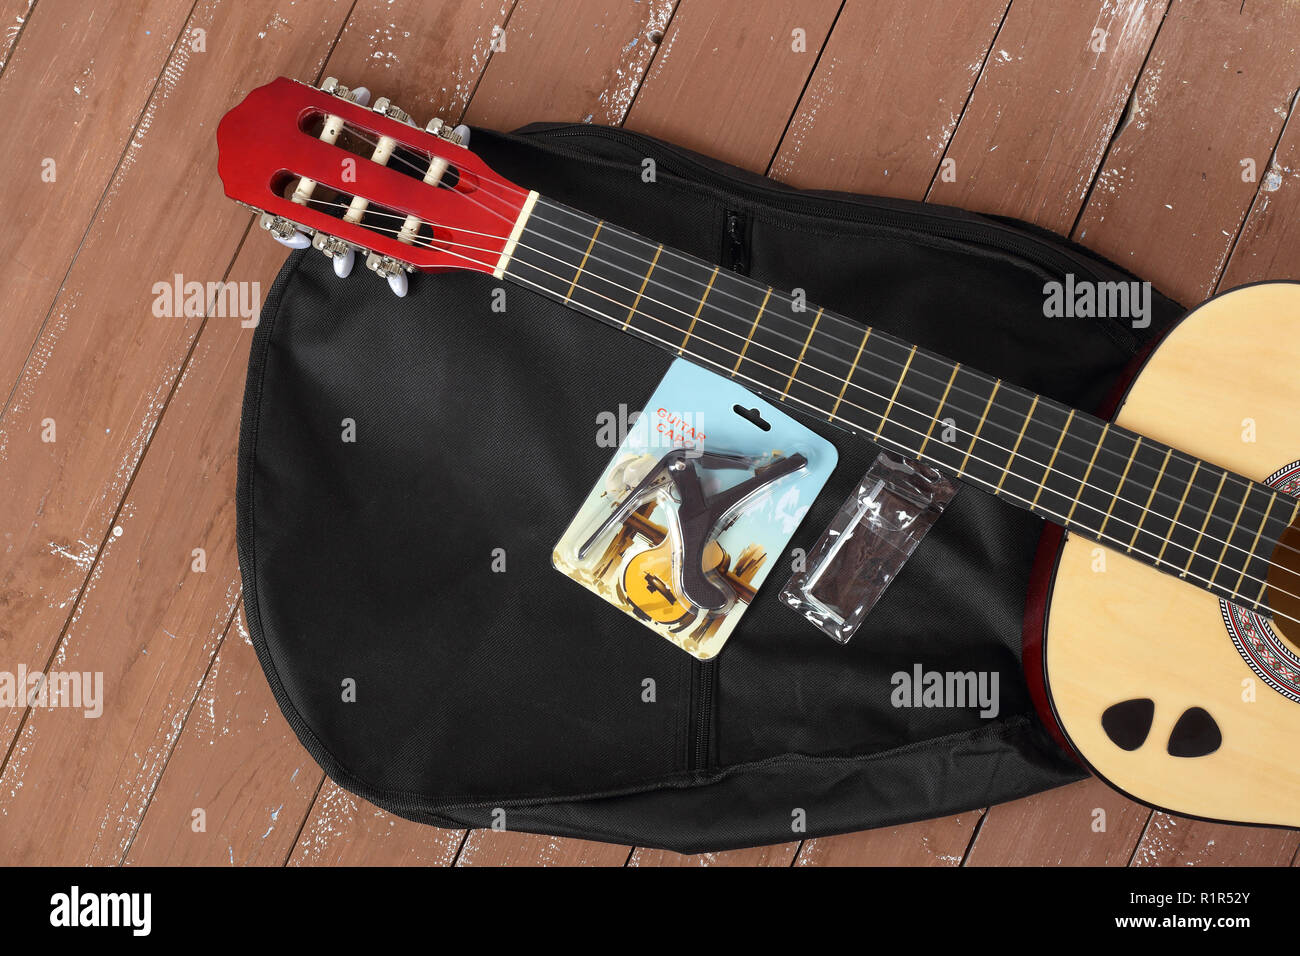 Musical instrument - Classic Guitar, case, capo, key, picks set wood background. Stock Photo